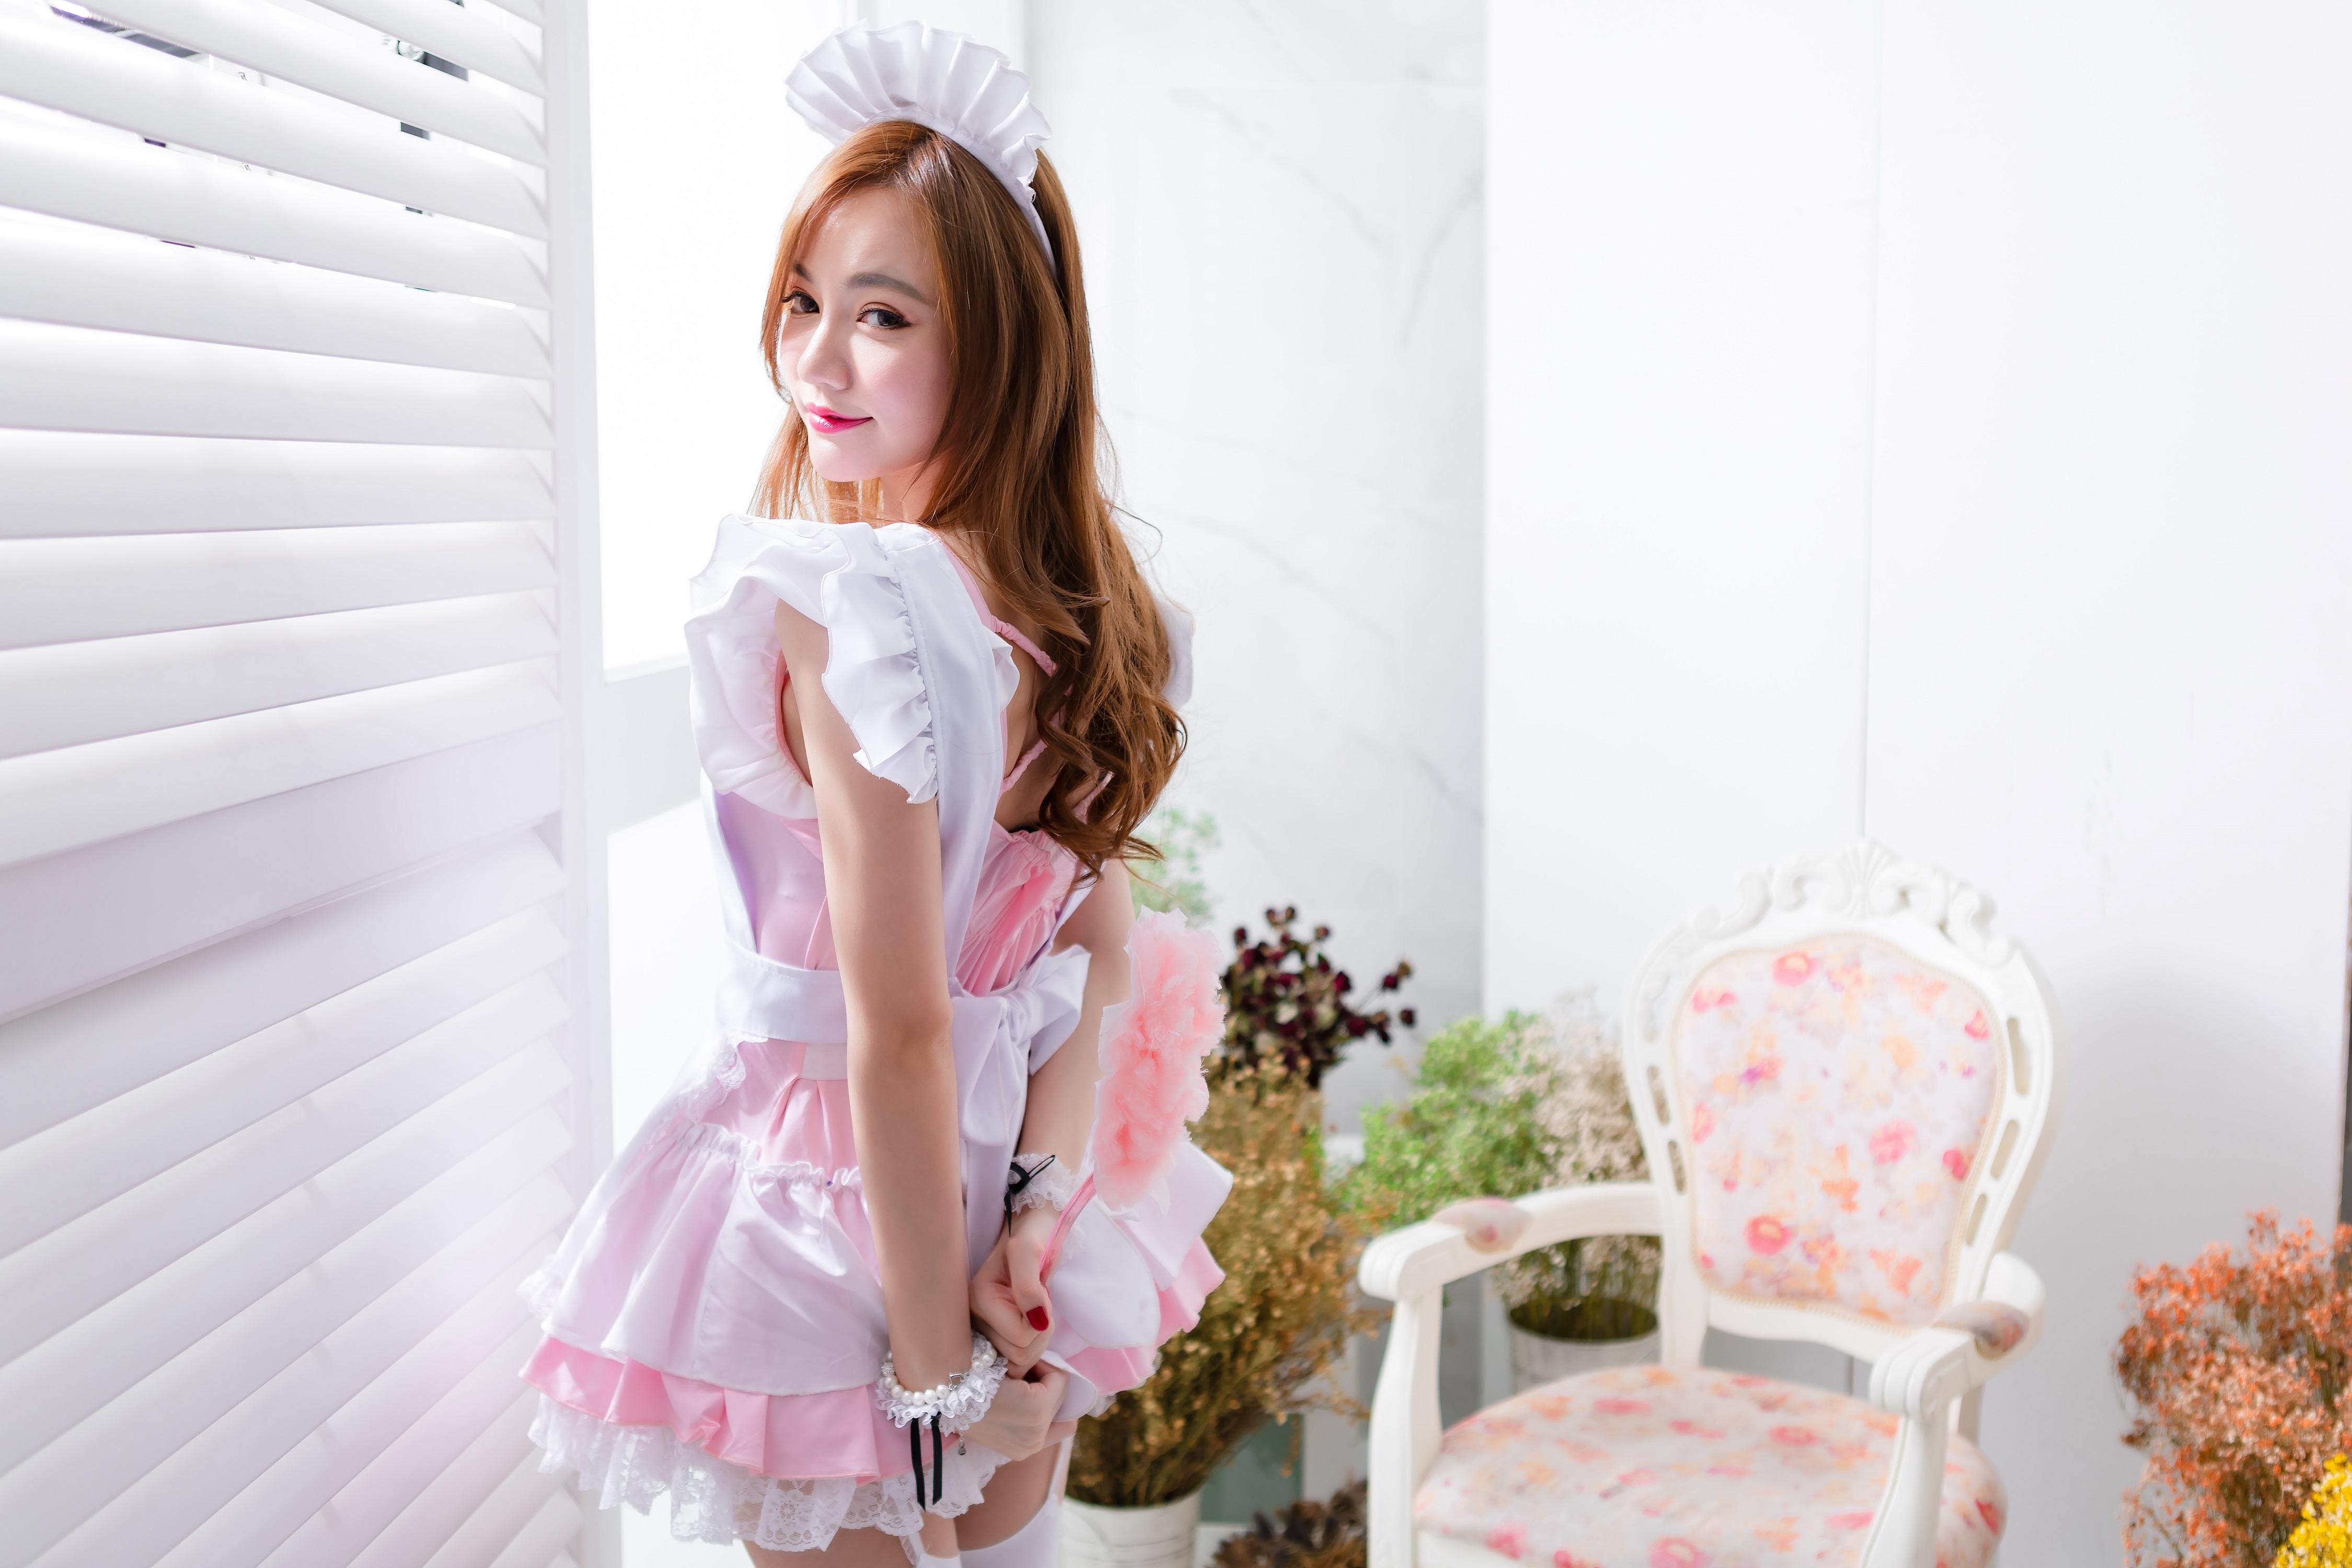 mature Maid brunette looking